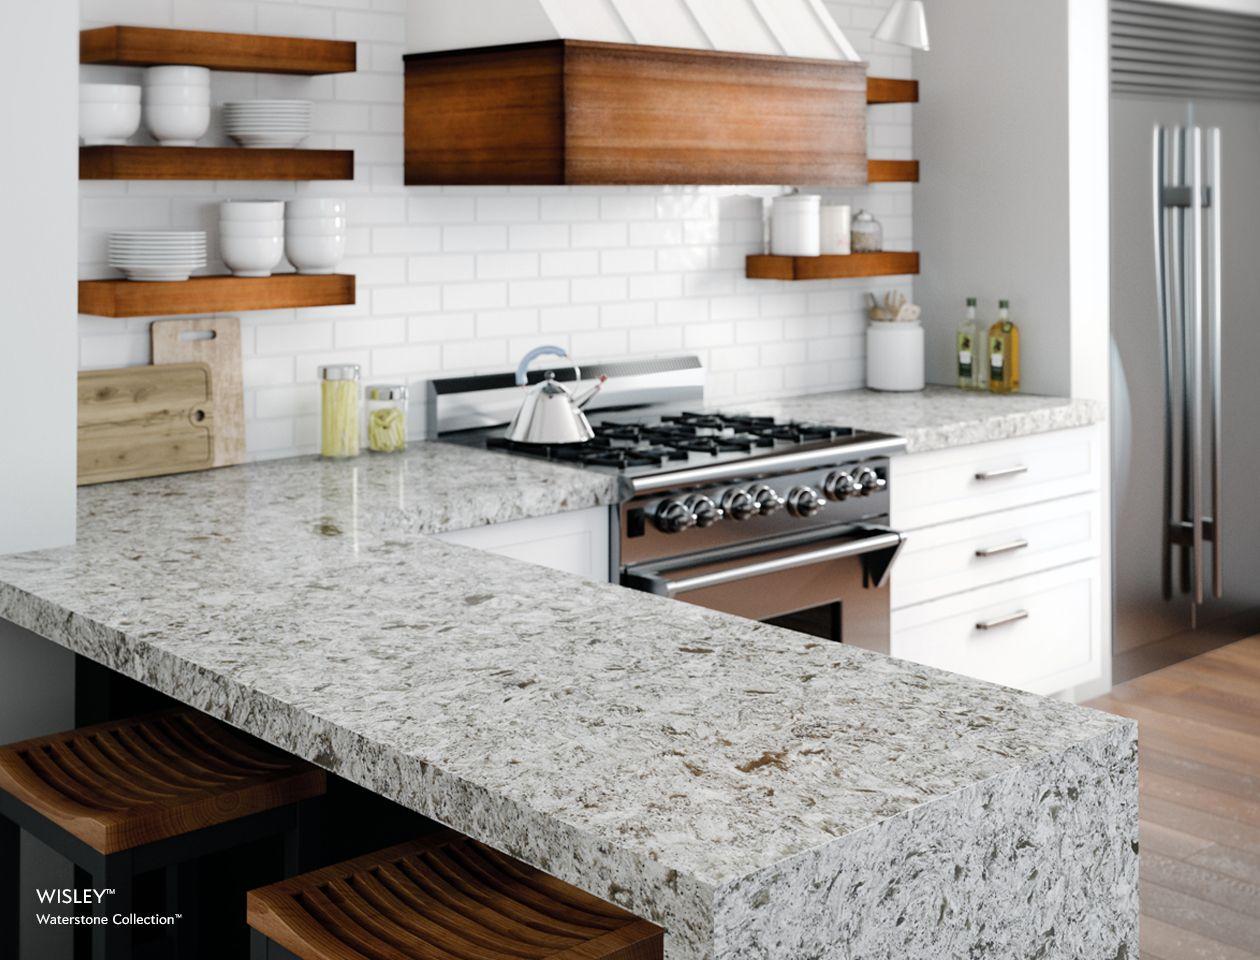 Image Library Cambria Natural Quartz Surfaces Butcher Block Countertops Cost Countertops Kitchen Redesign